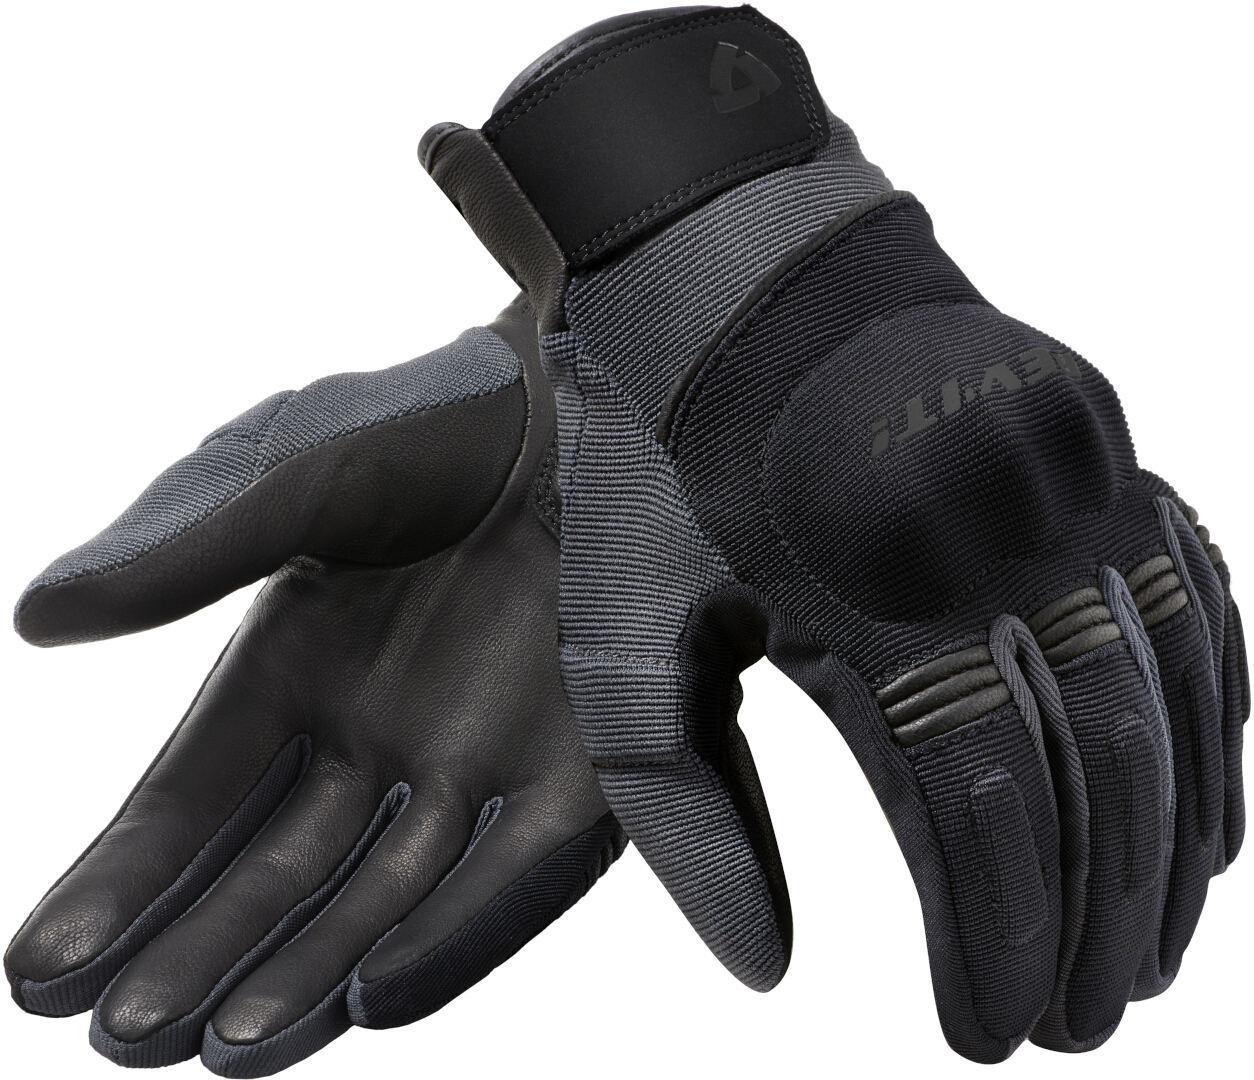 Revit Mosca H2O Motorradhandschuhe, schwarz-grau, Größe XL, schwarz-grau, Größe XL